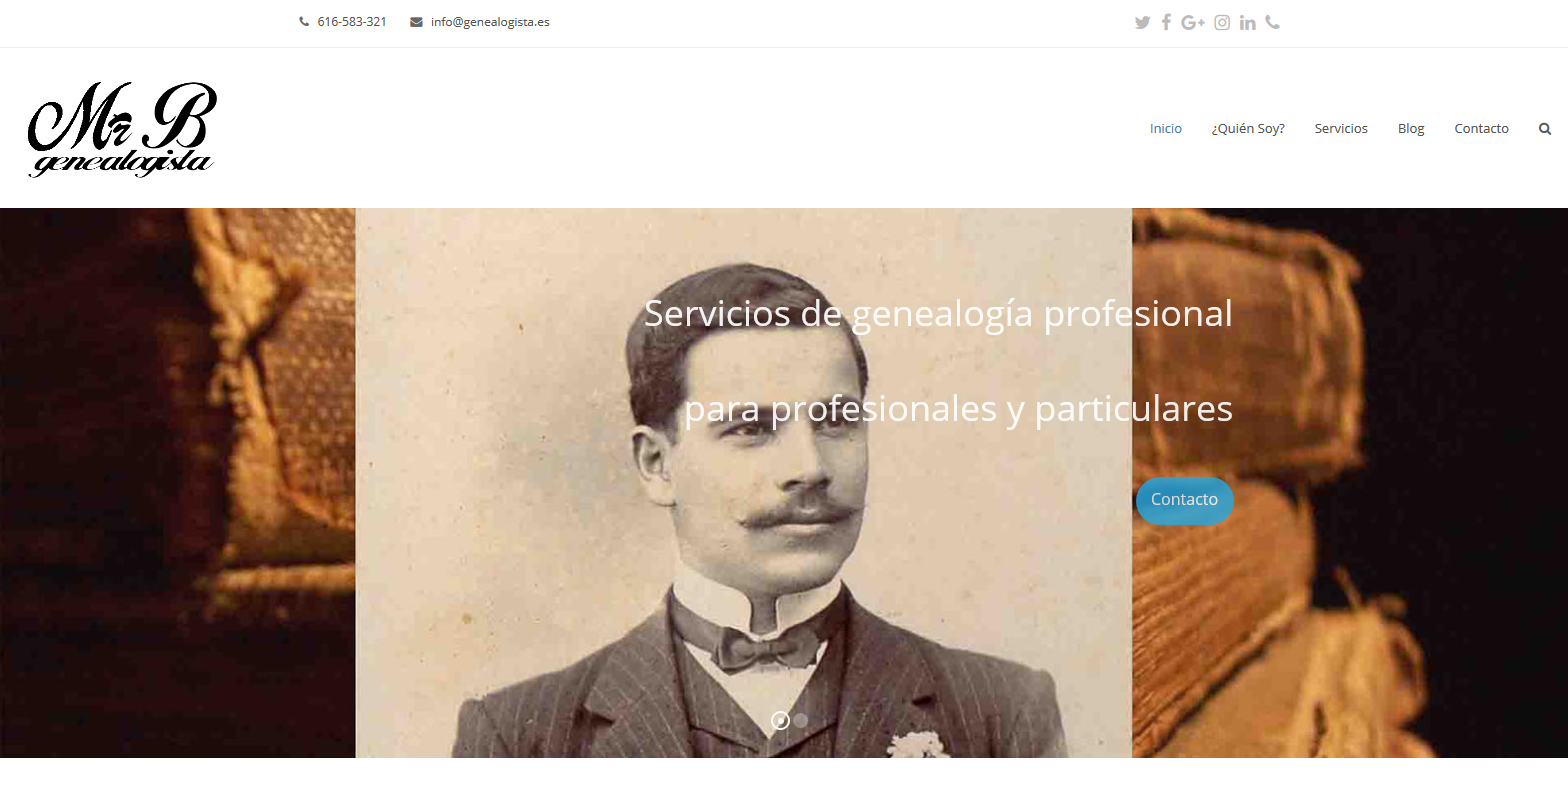 Genalogista.es